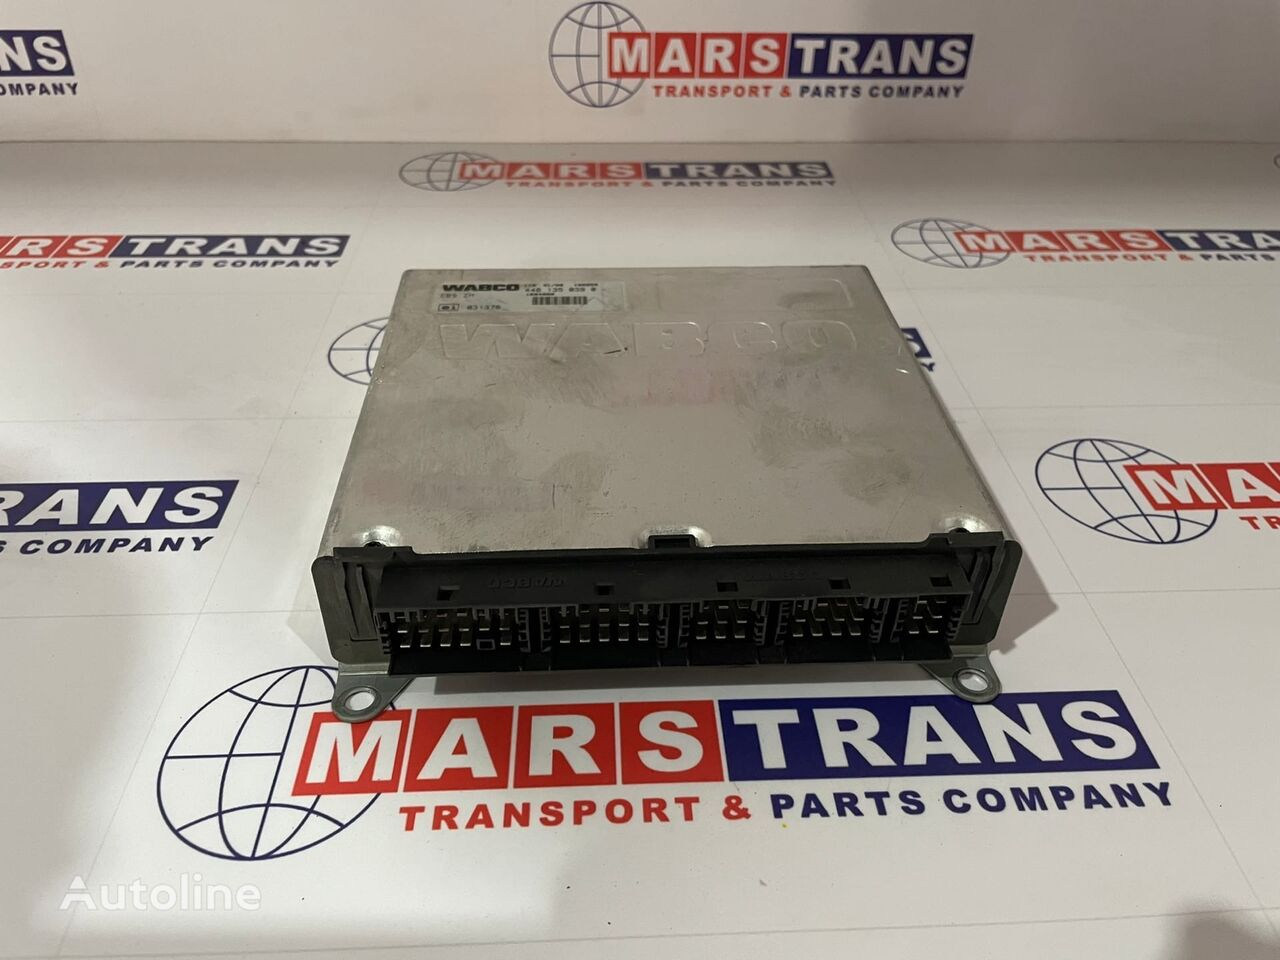 MERCEDES-BENZ EBS MERCEDES ACTROS unidad de control para camión